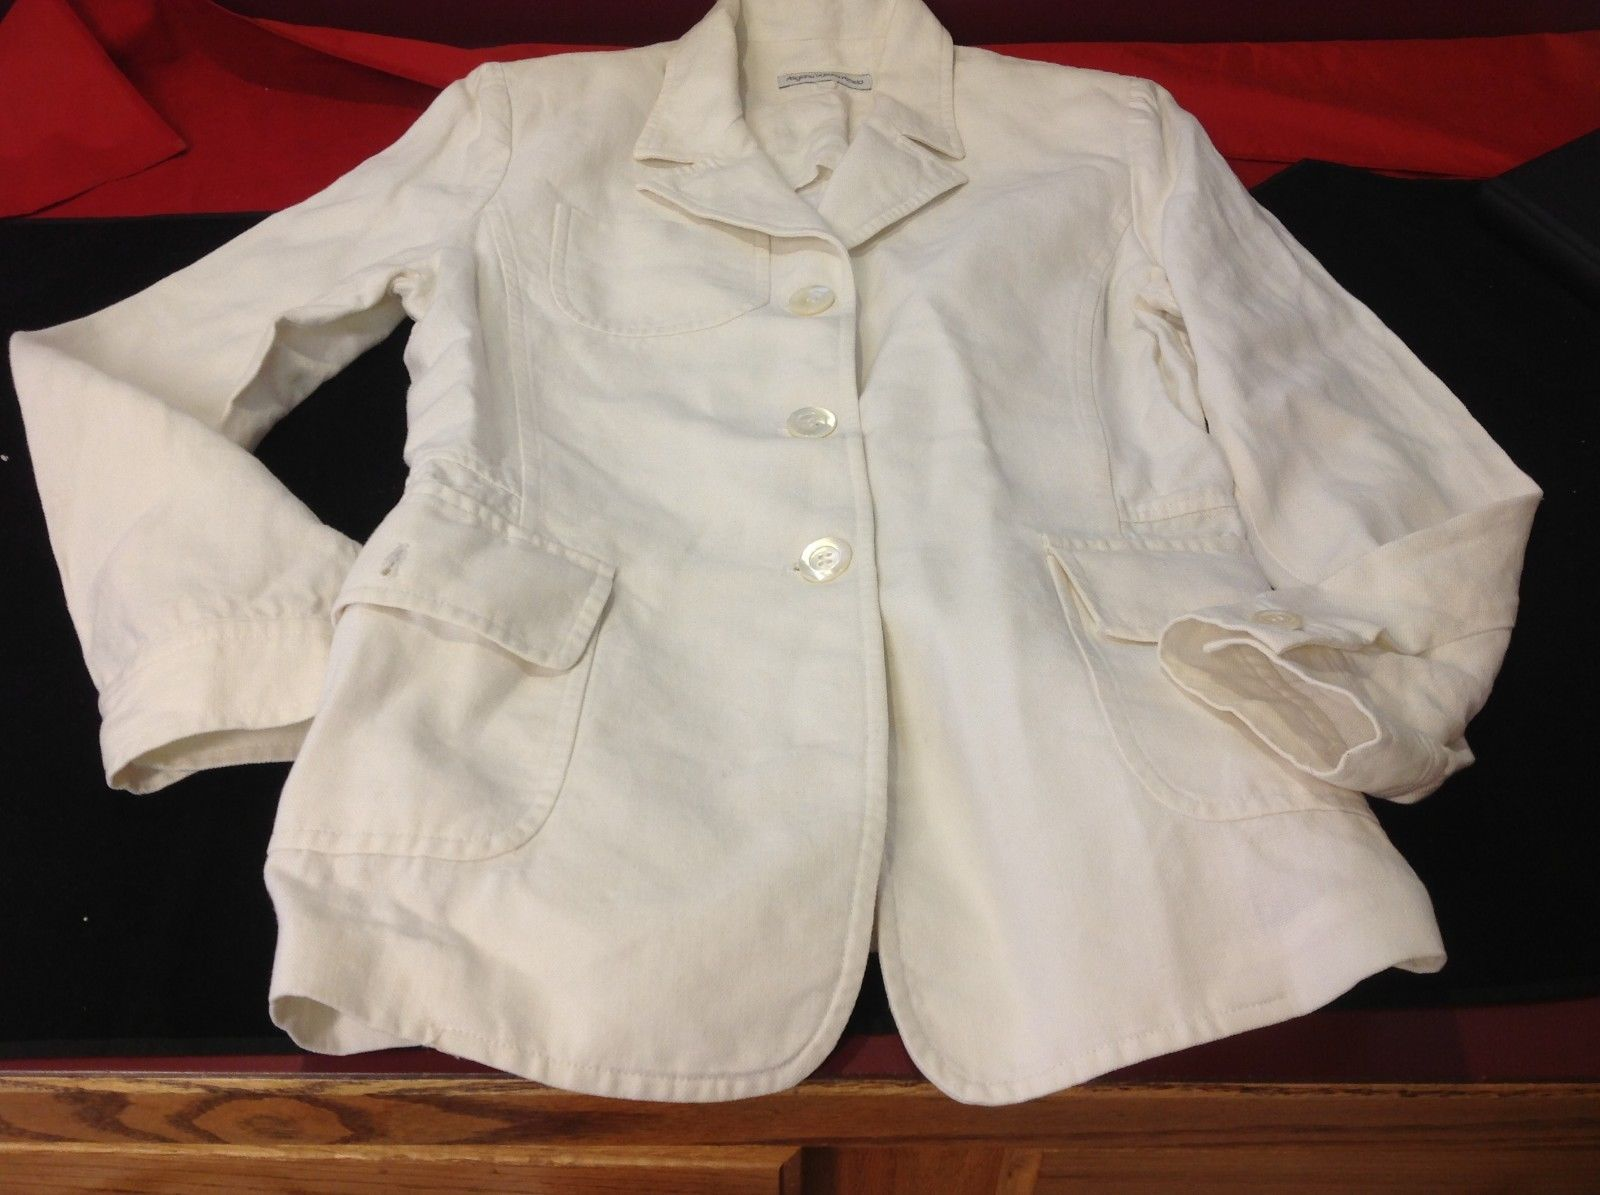 Artigiana Sartoria Venela  cream blazer for woman 15 in wide 26 in long